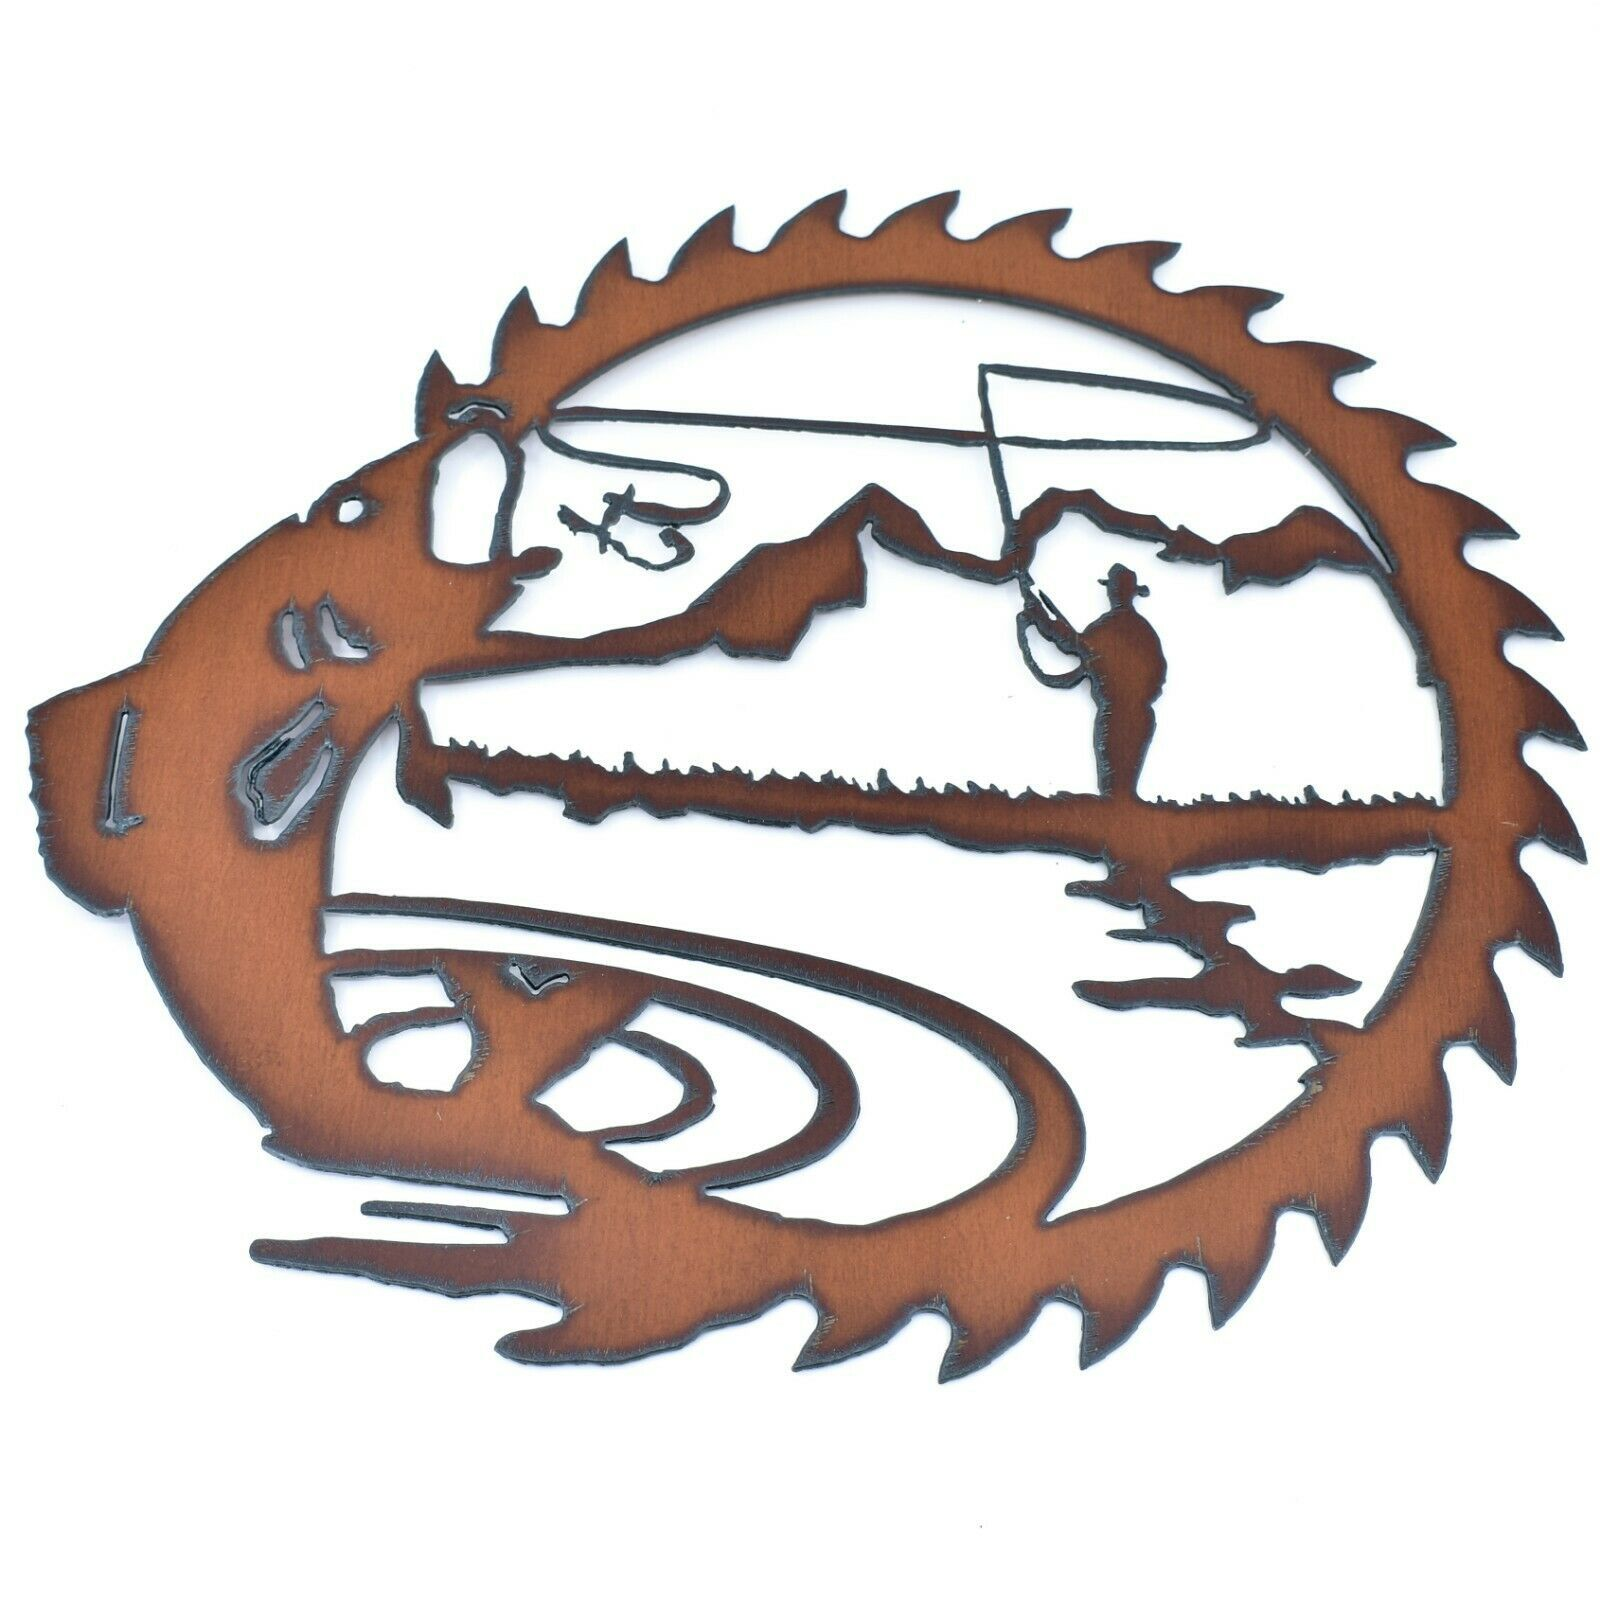 "Rustic Rusted Patina Iron Metal Cutout Saw Fly Fishing Design 12"" Wall Decor"